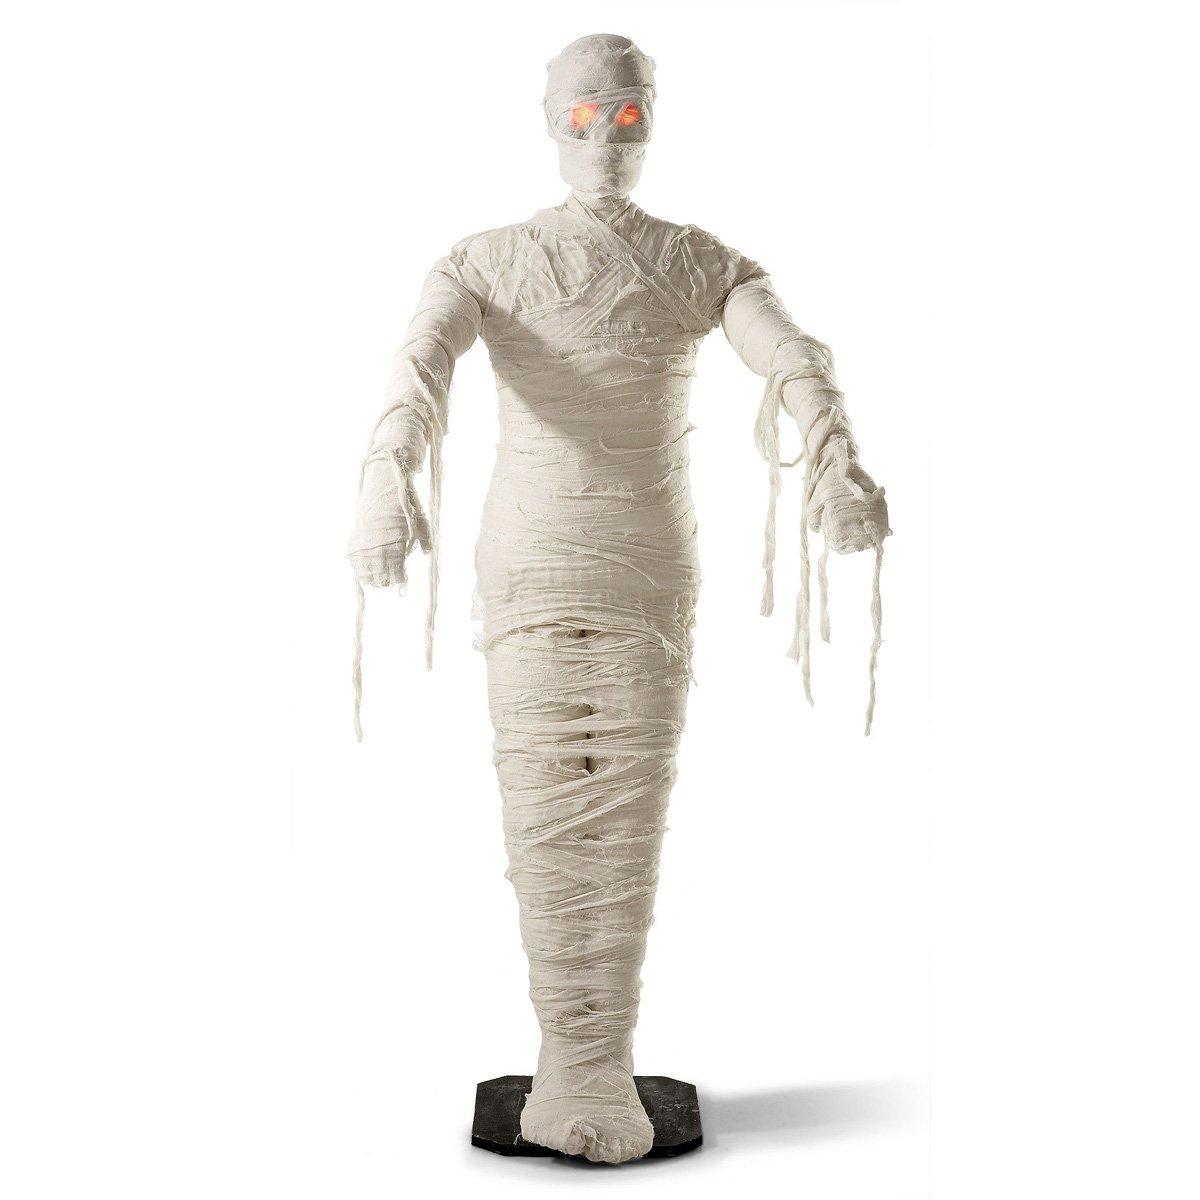 Posable Lifesized Wrapped Mummy Statues